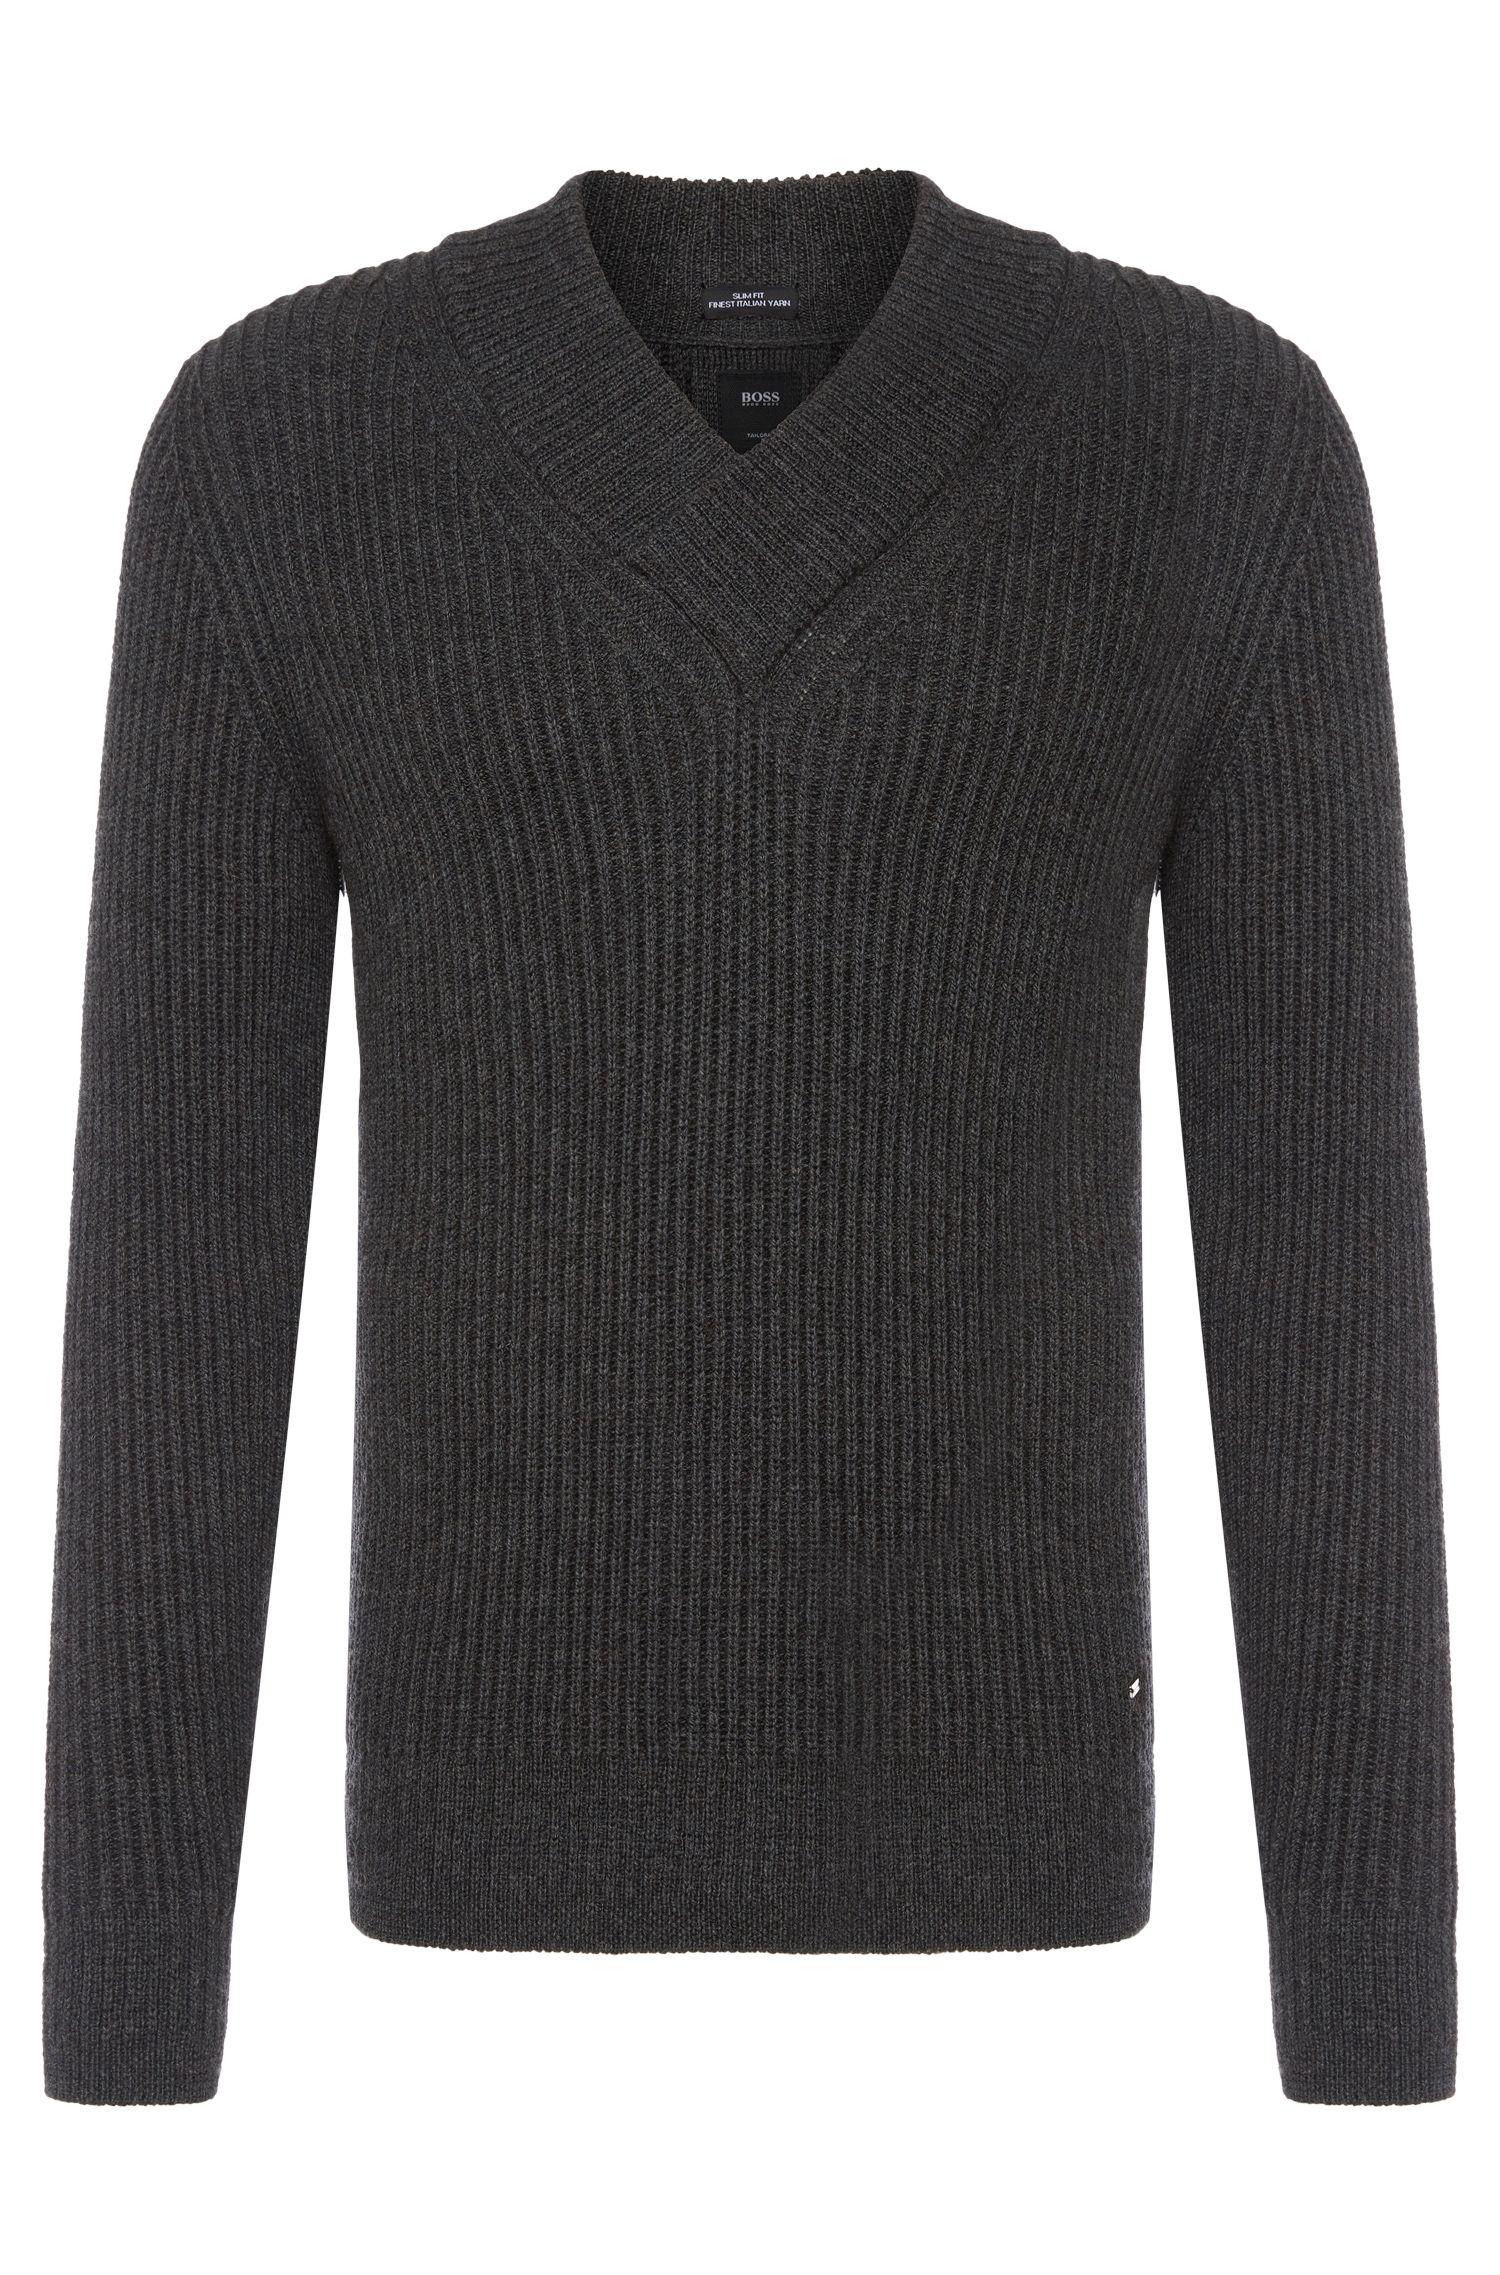 'T-Bressano' | Italian Alpaca Virgin Wool Surplice V-Neck Sweater